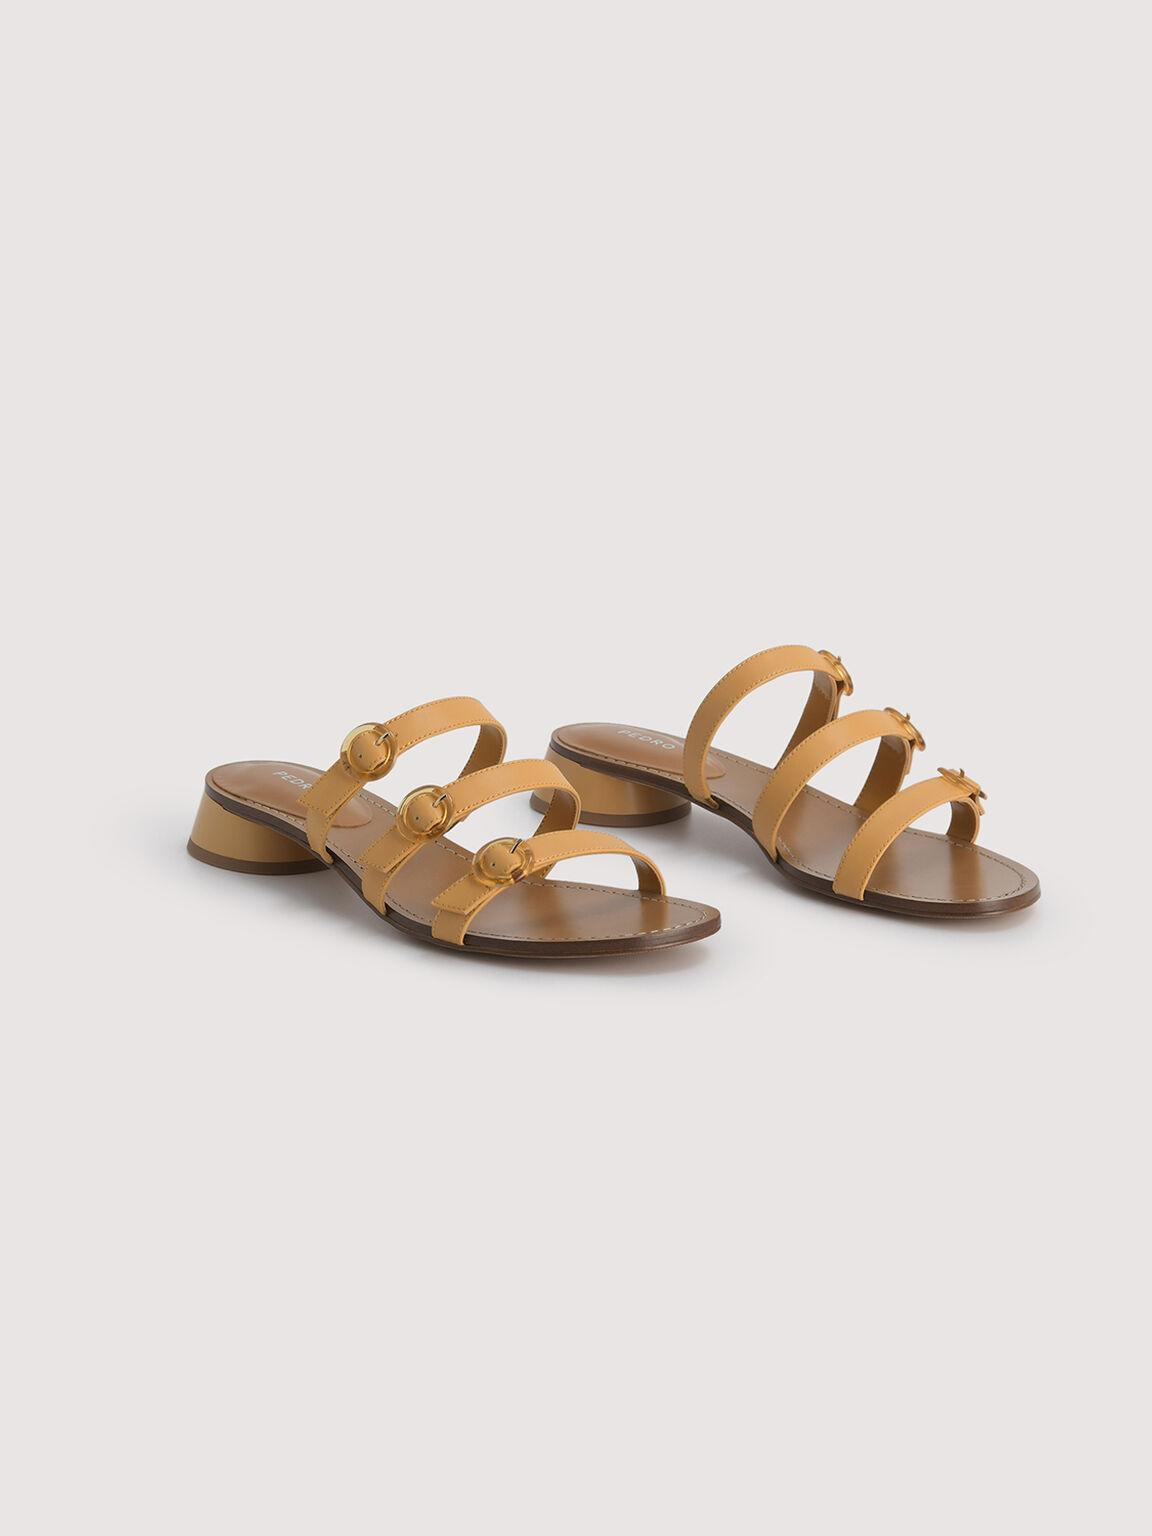 Buckled Strapped Sandals, Mustard, hi-res